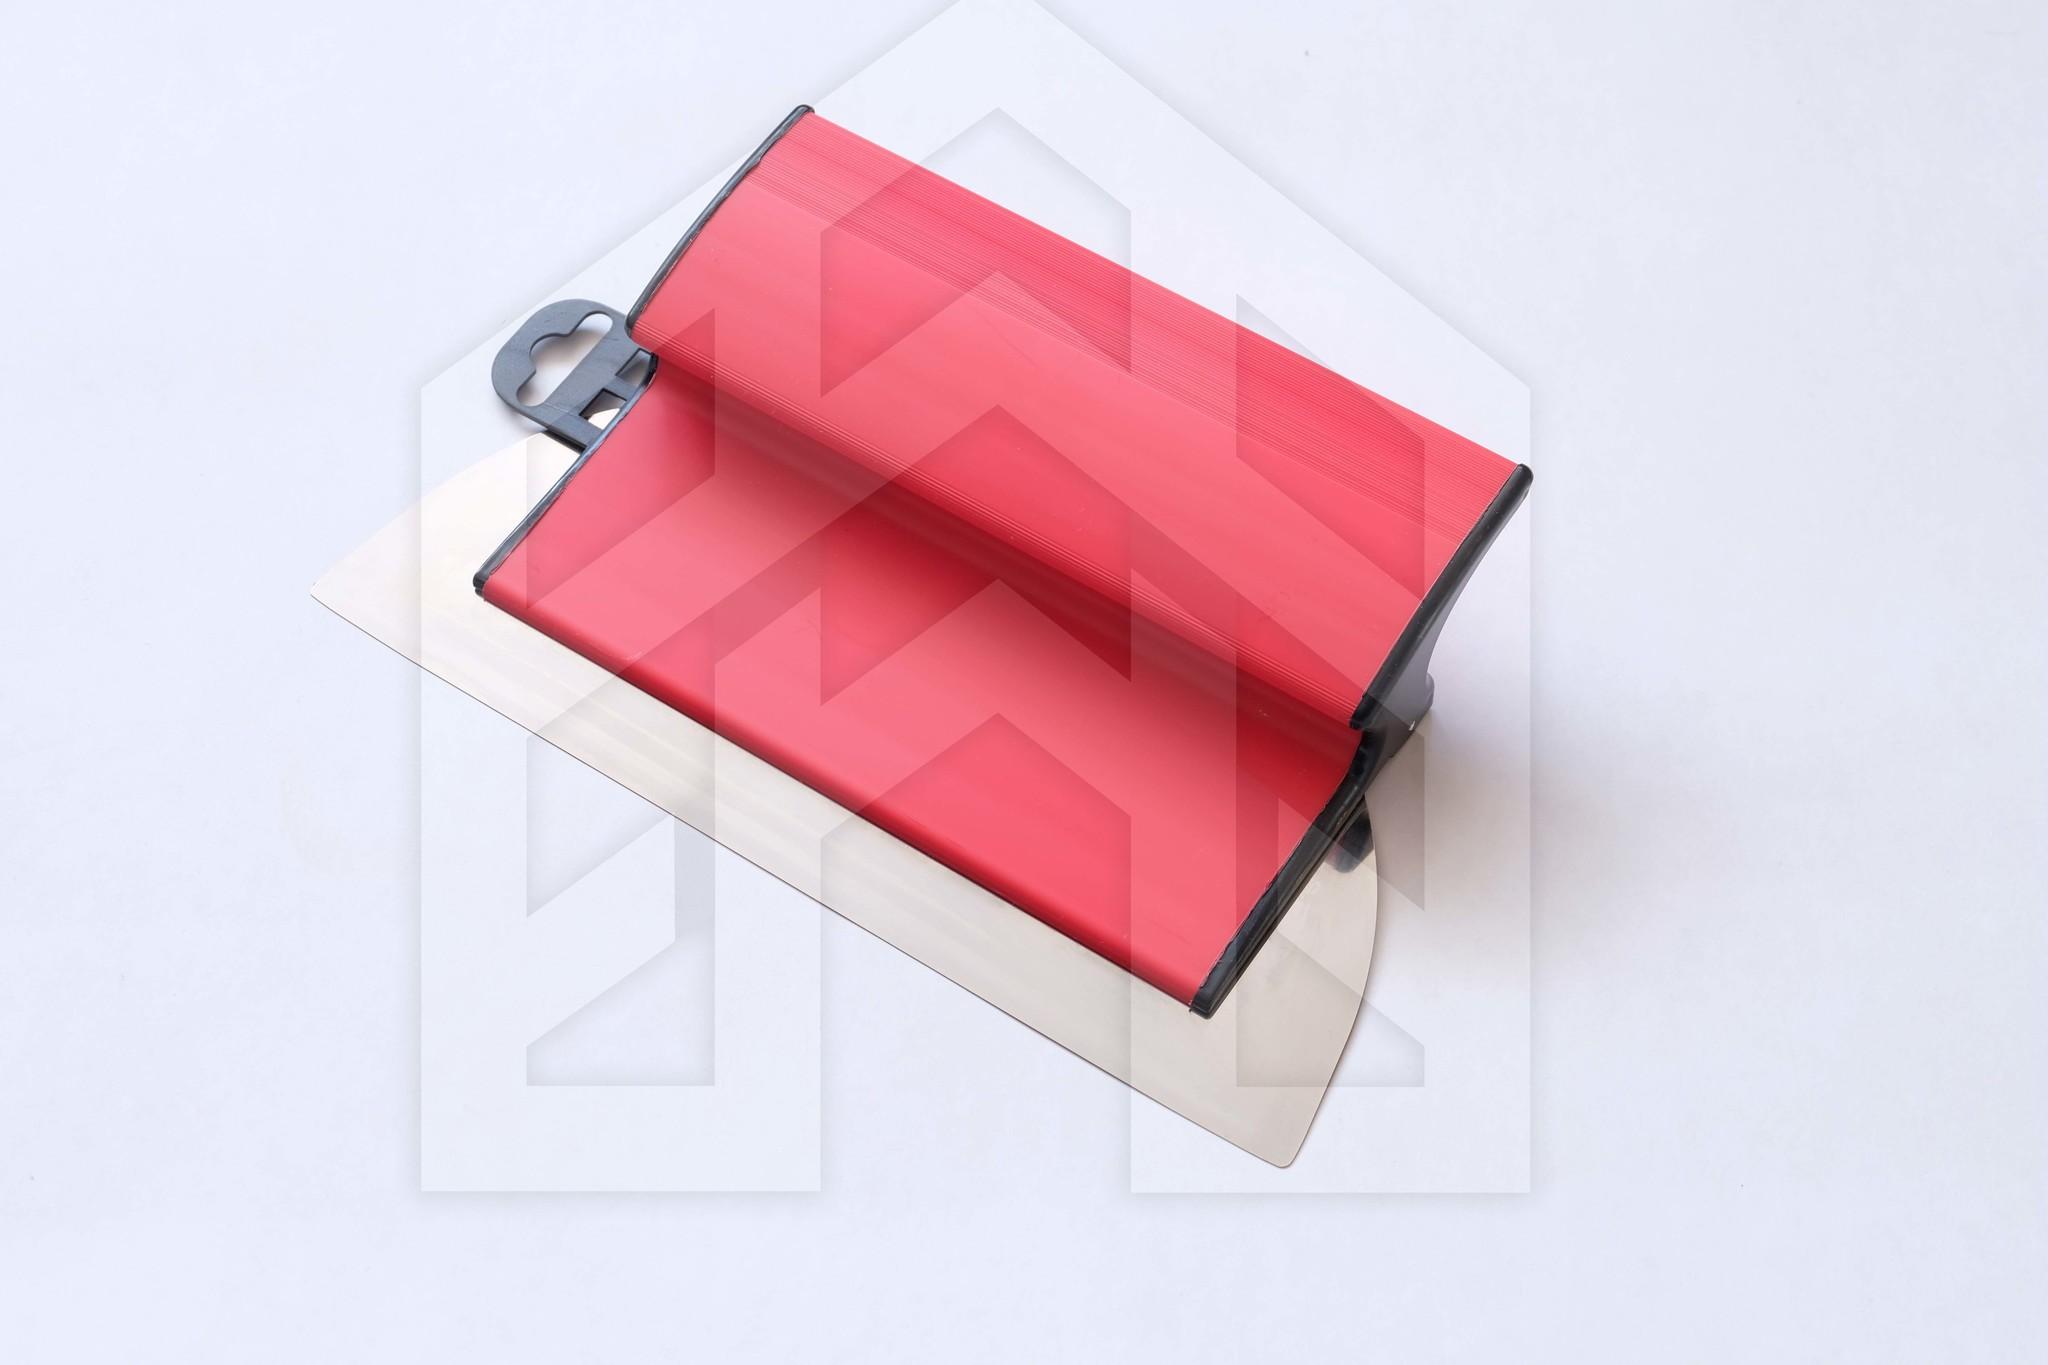 Home of Concrete HoC Glatte Kelle | Stainless Steel Pro